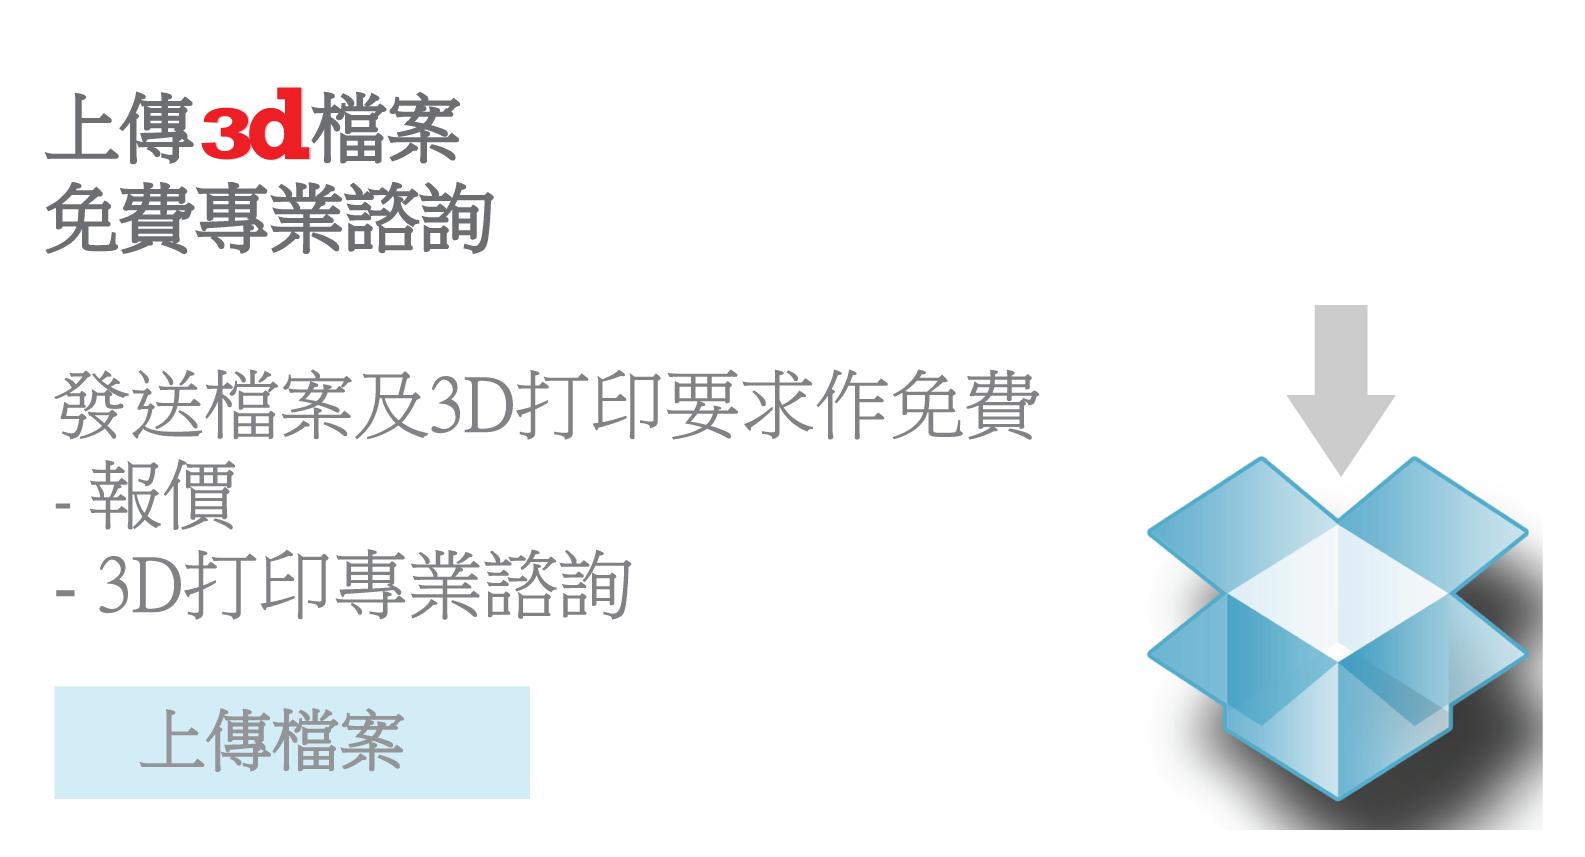 ABS-M30 塑膠 | HK3DPrint | 香港專業3D打印服務